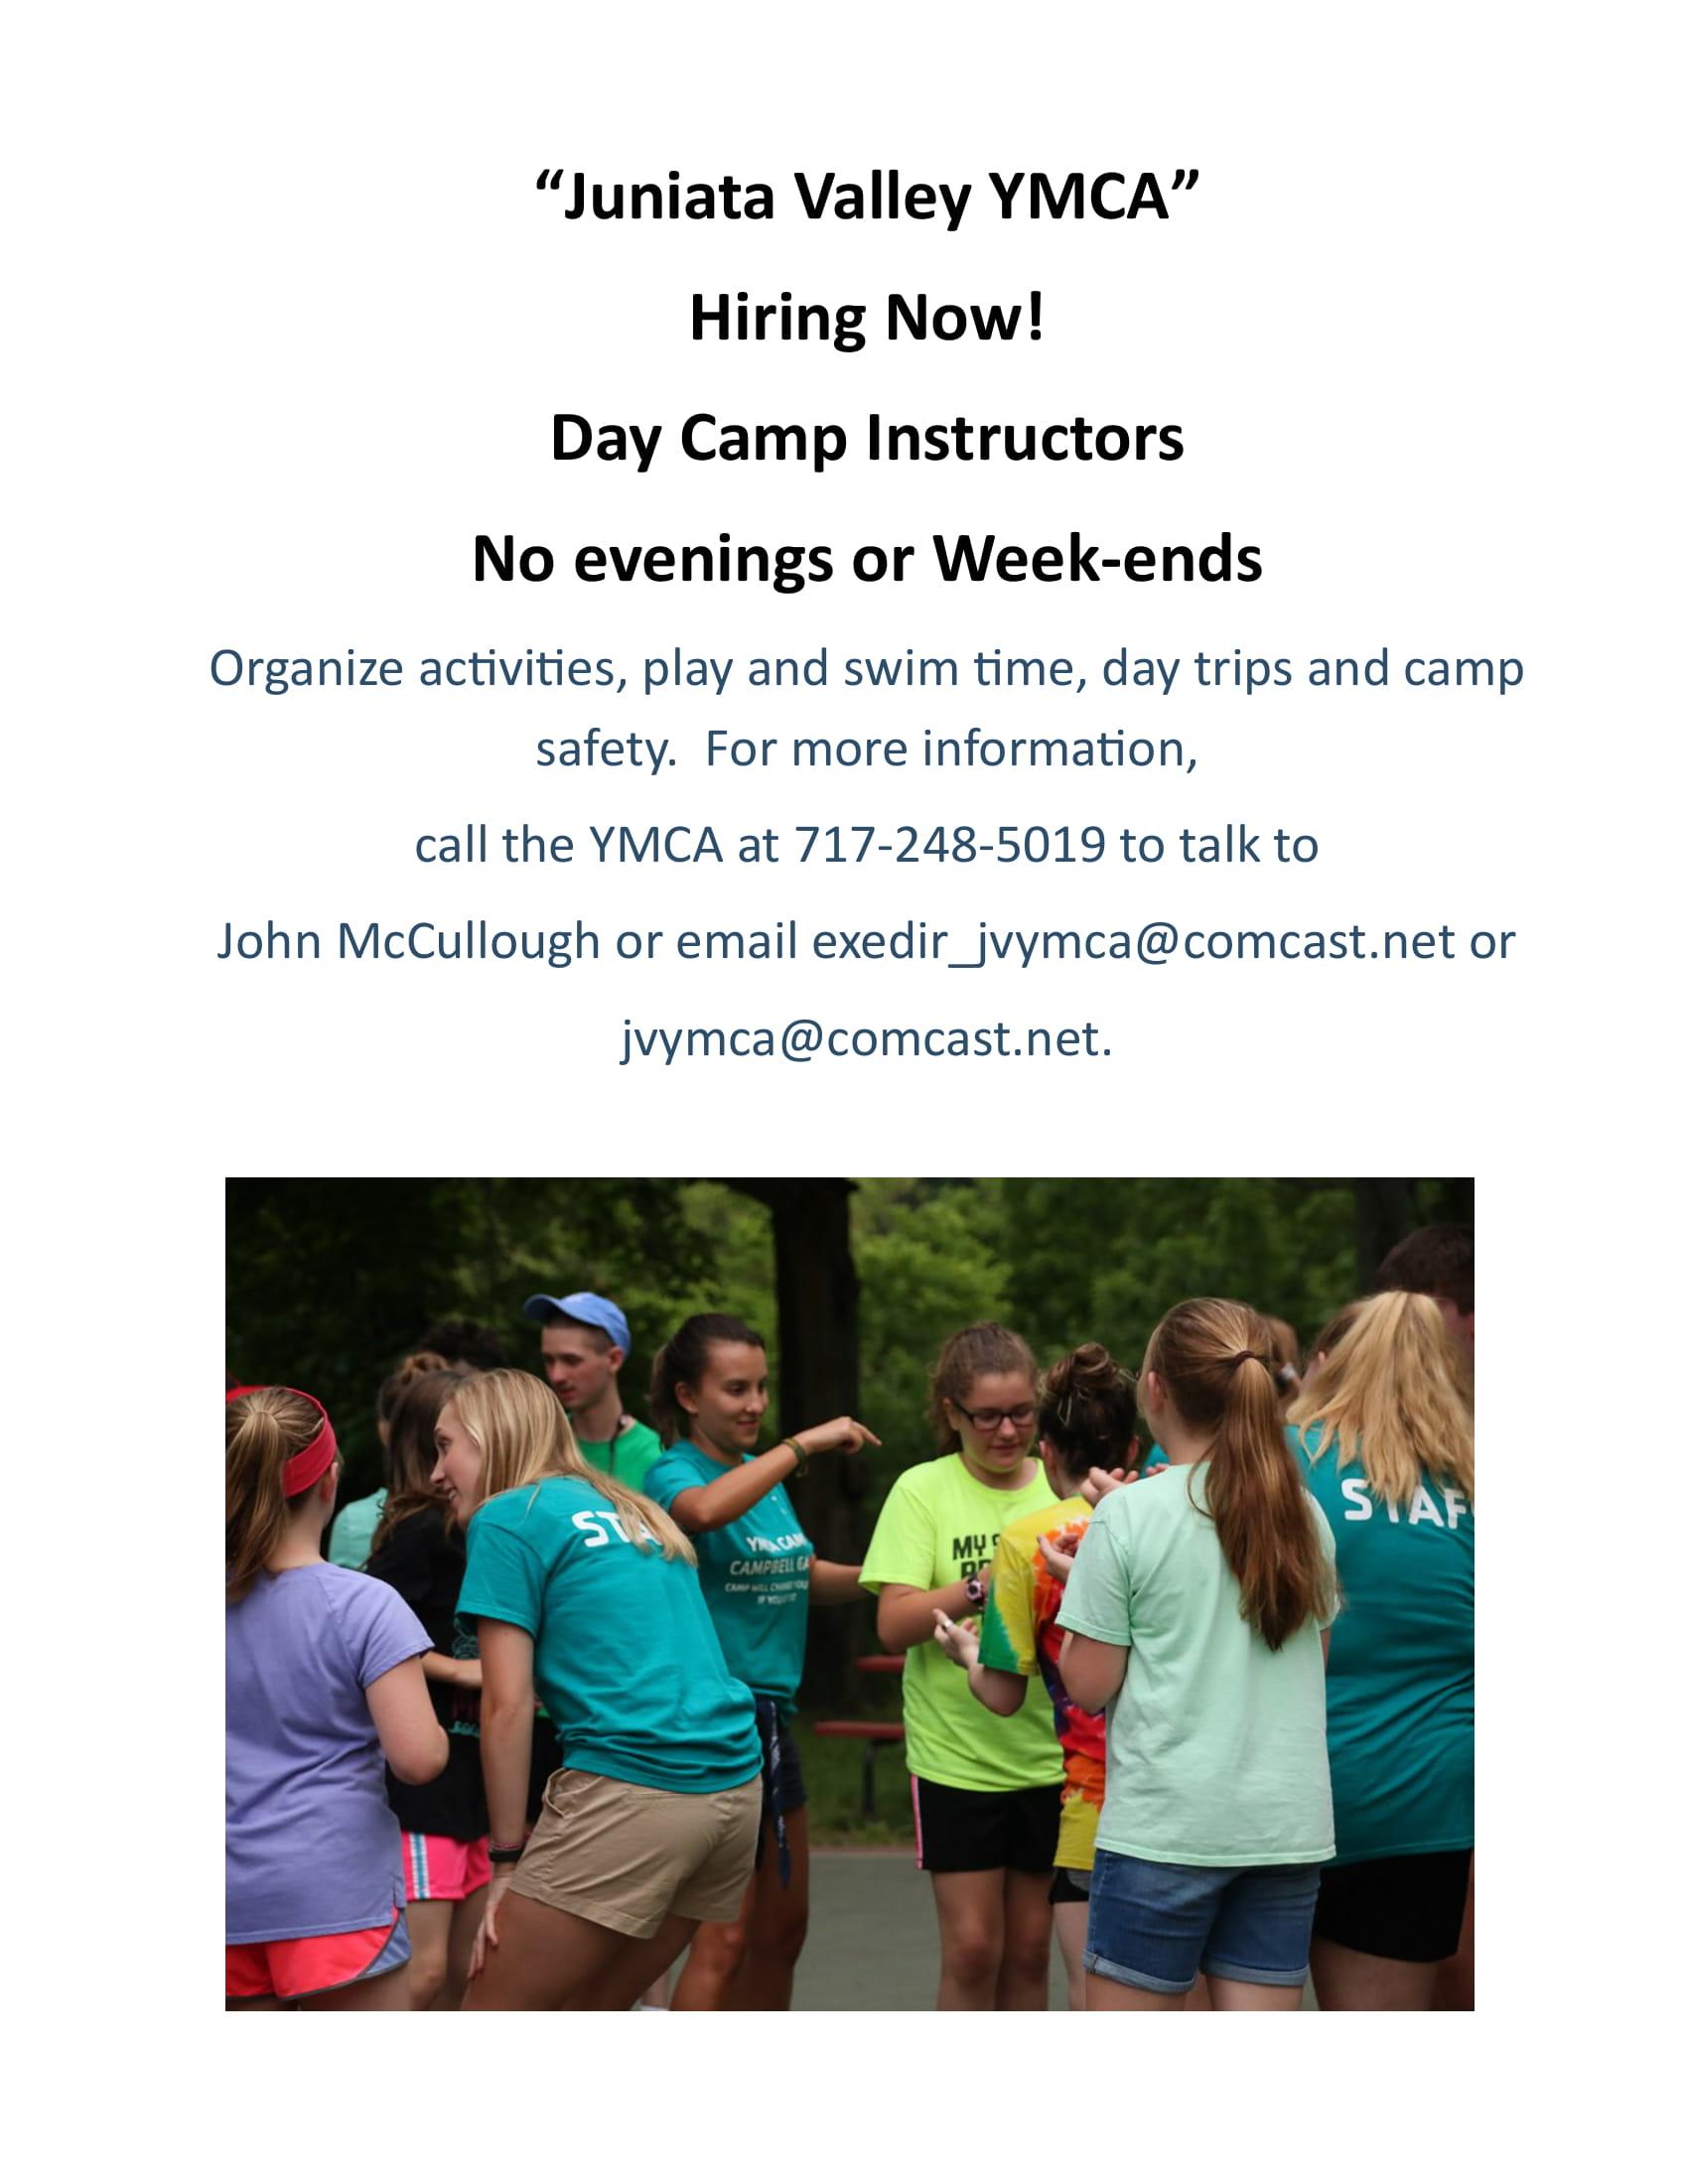 JVYMCA Day Camp Hire Poster